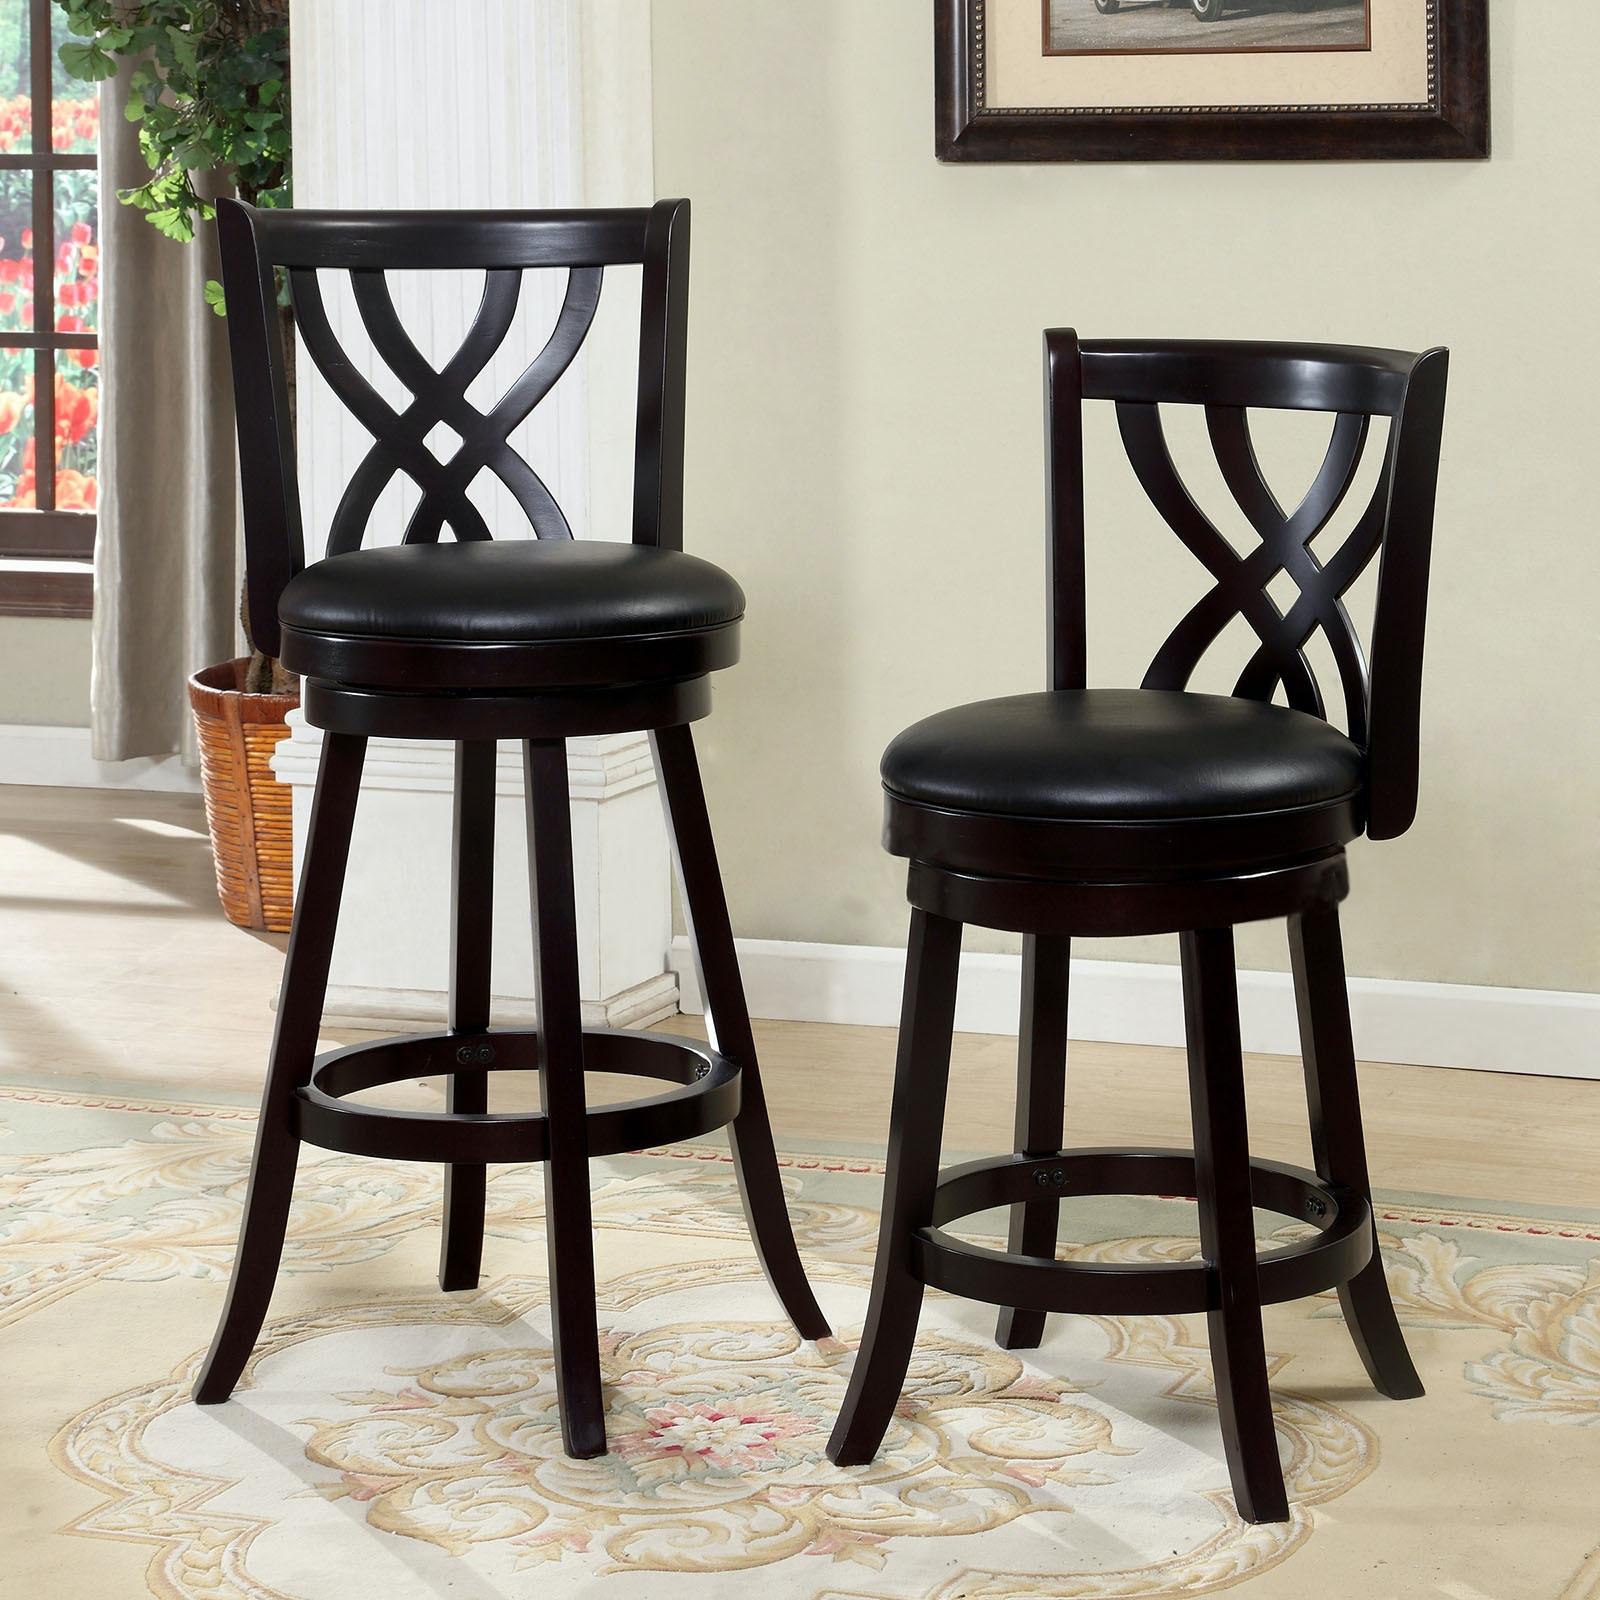 Furniture Of America Dining Room 24 Swivel Bar Stool Espresso Cm